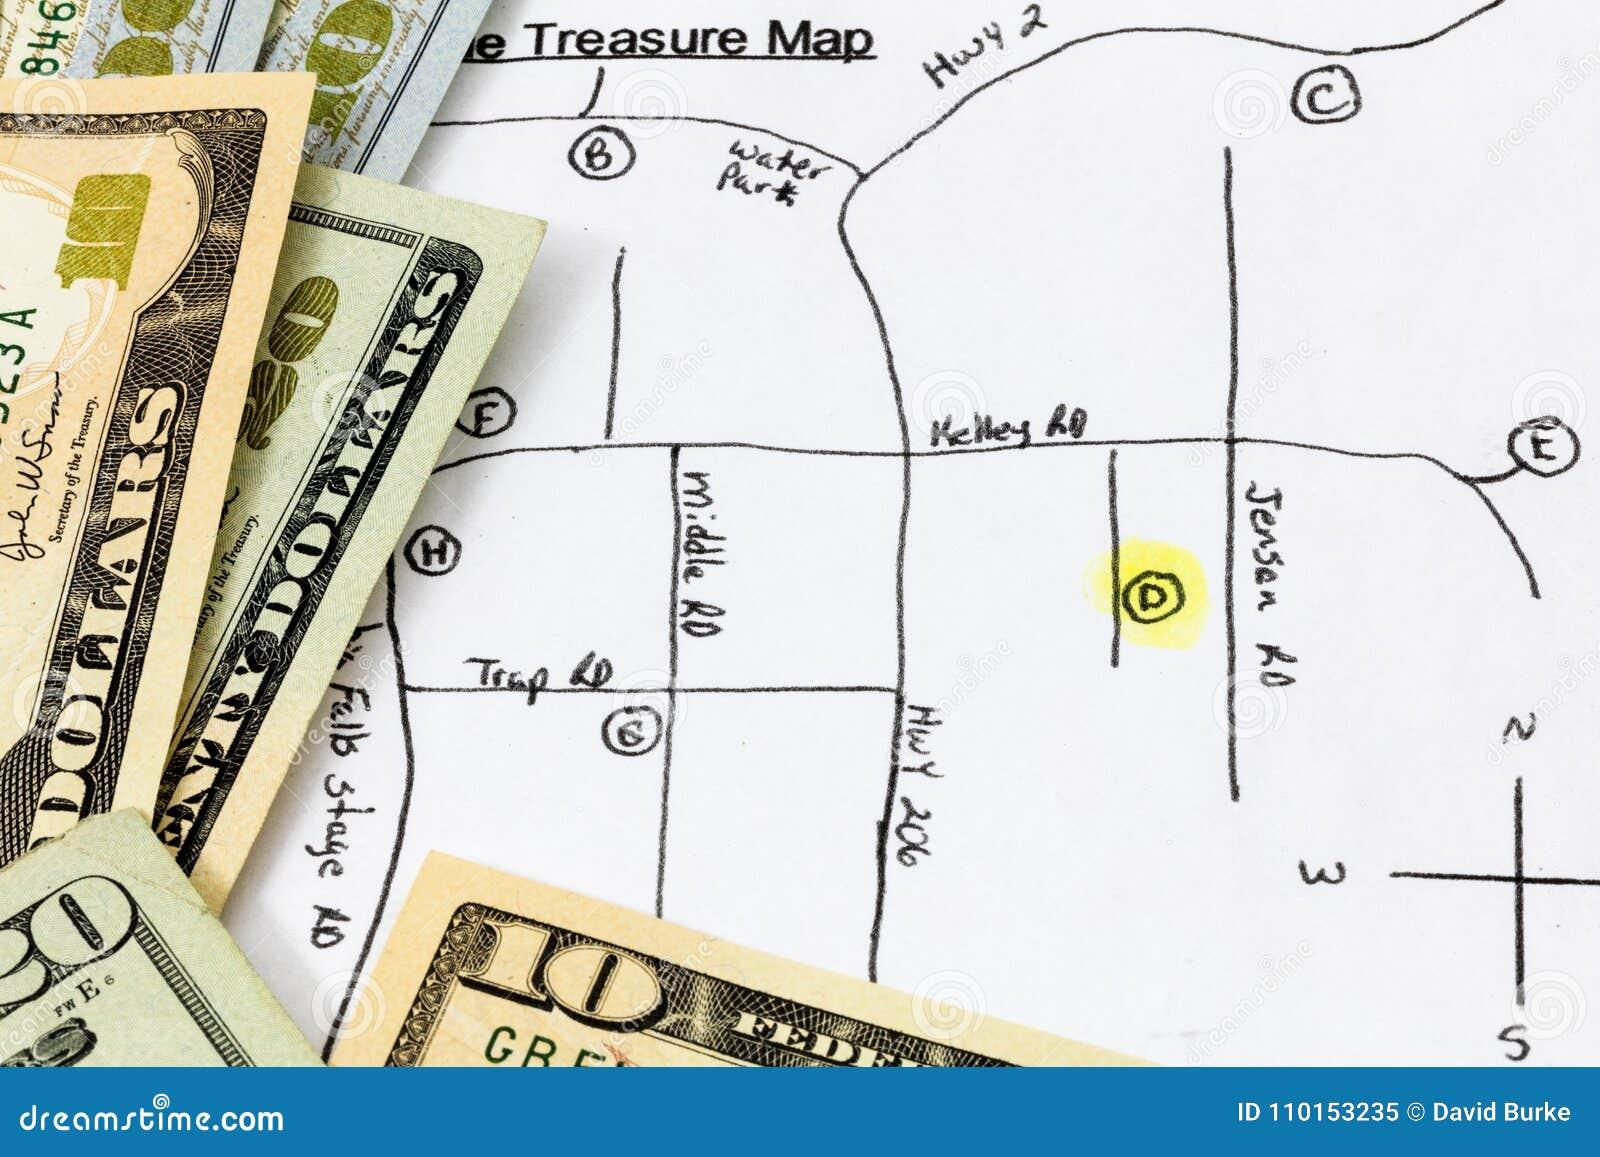 Treasure Hunt Map Money Cash Stock Image - Image of driving ... on